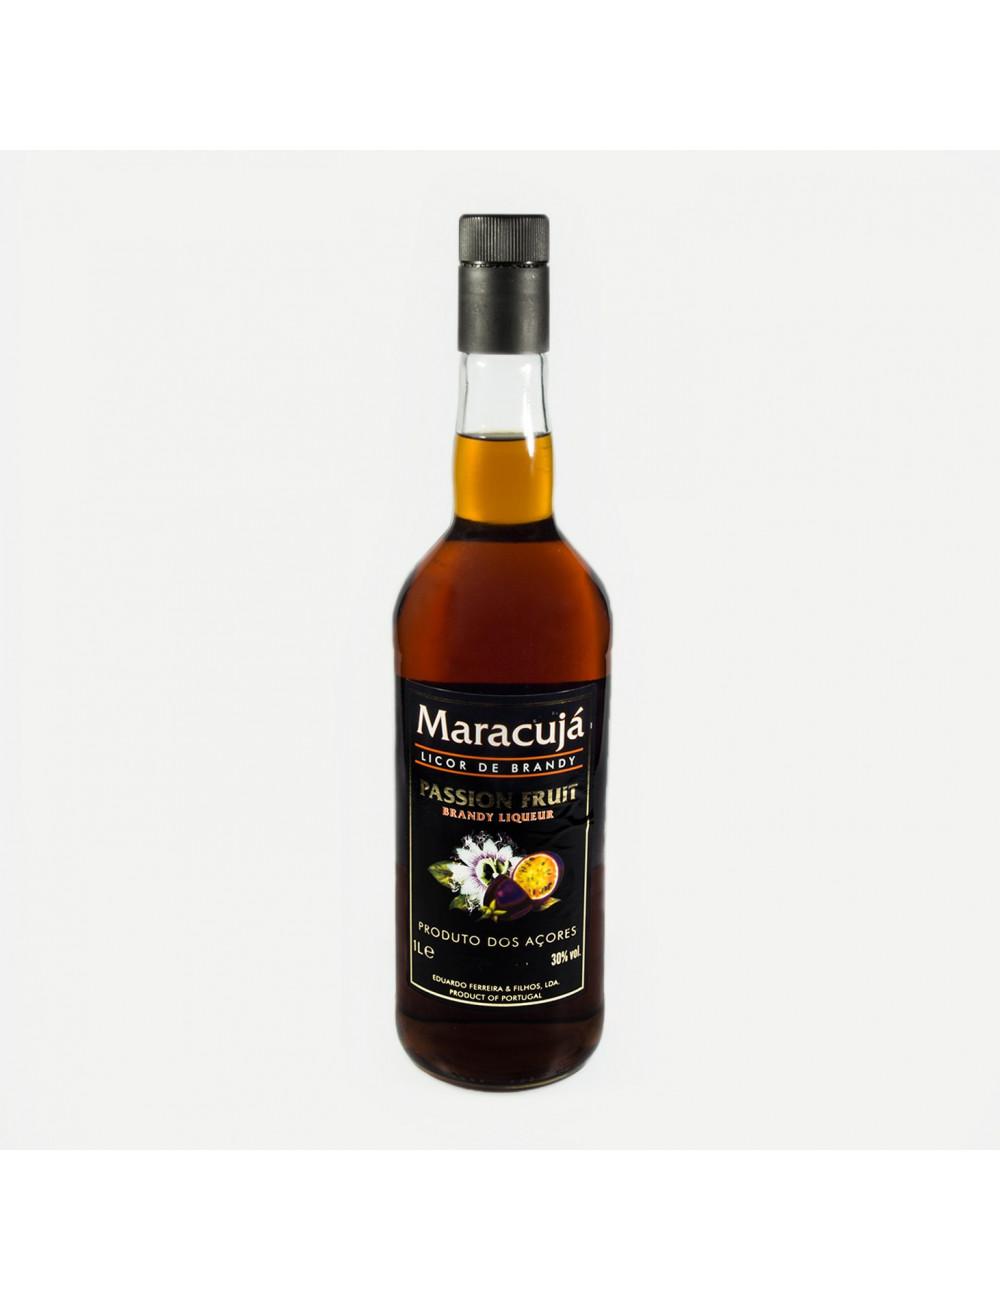 Passionfruit Brandy